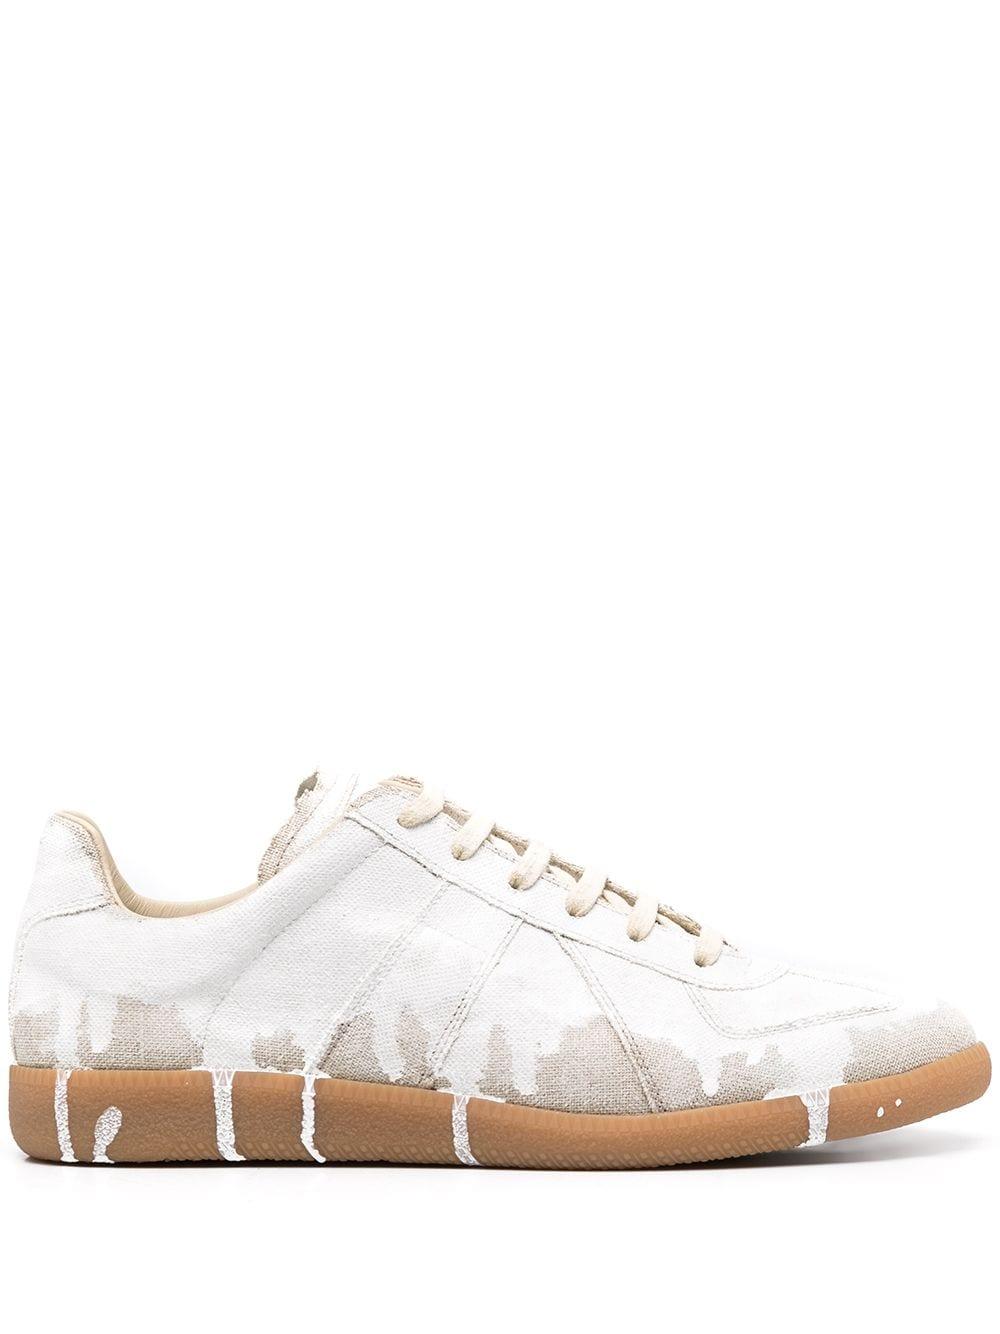 REPLICA SNEAKERS  MAISON MARGIELA | Sneakers | S57WS0374 P3957H8545